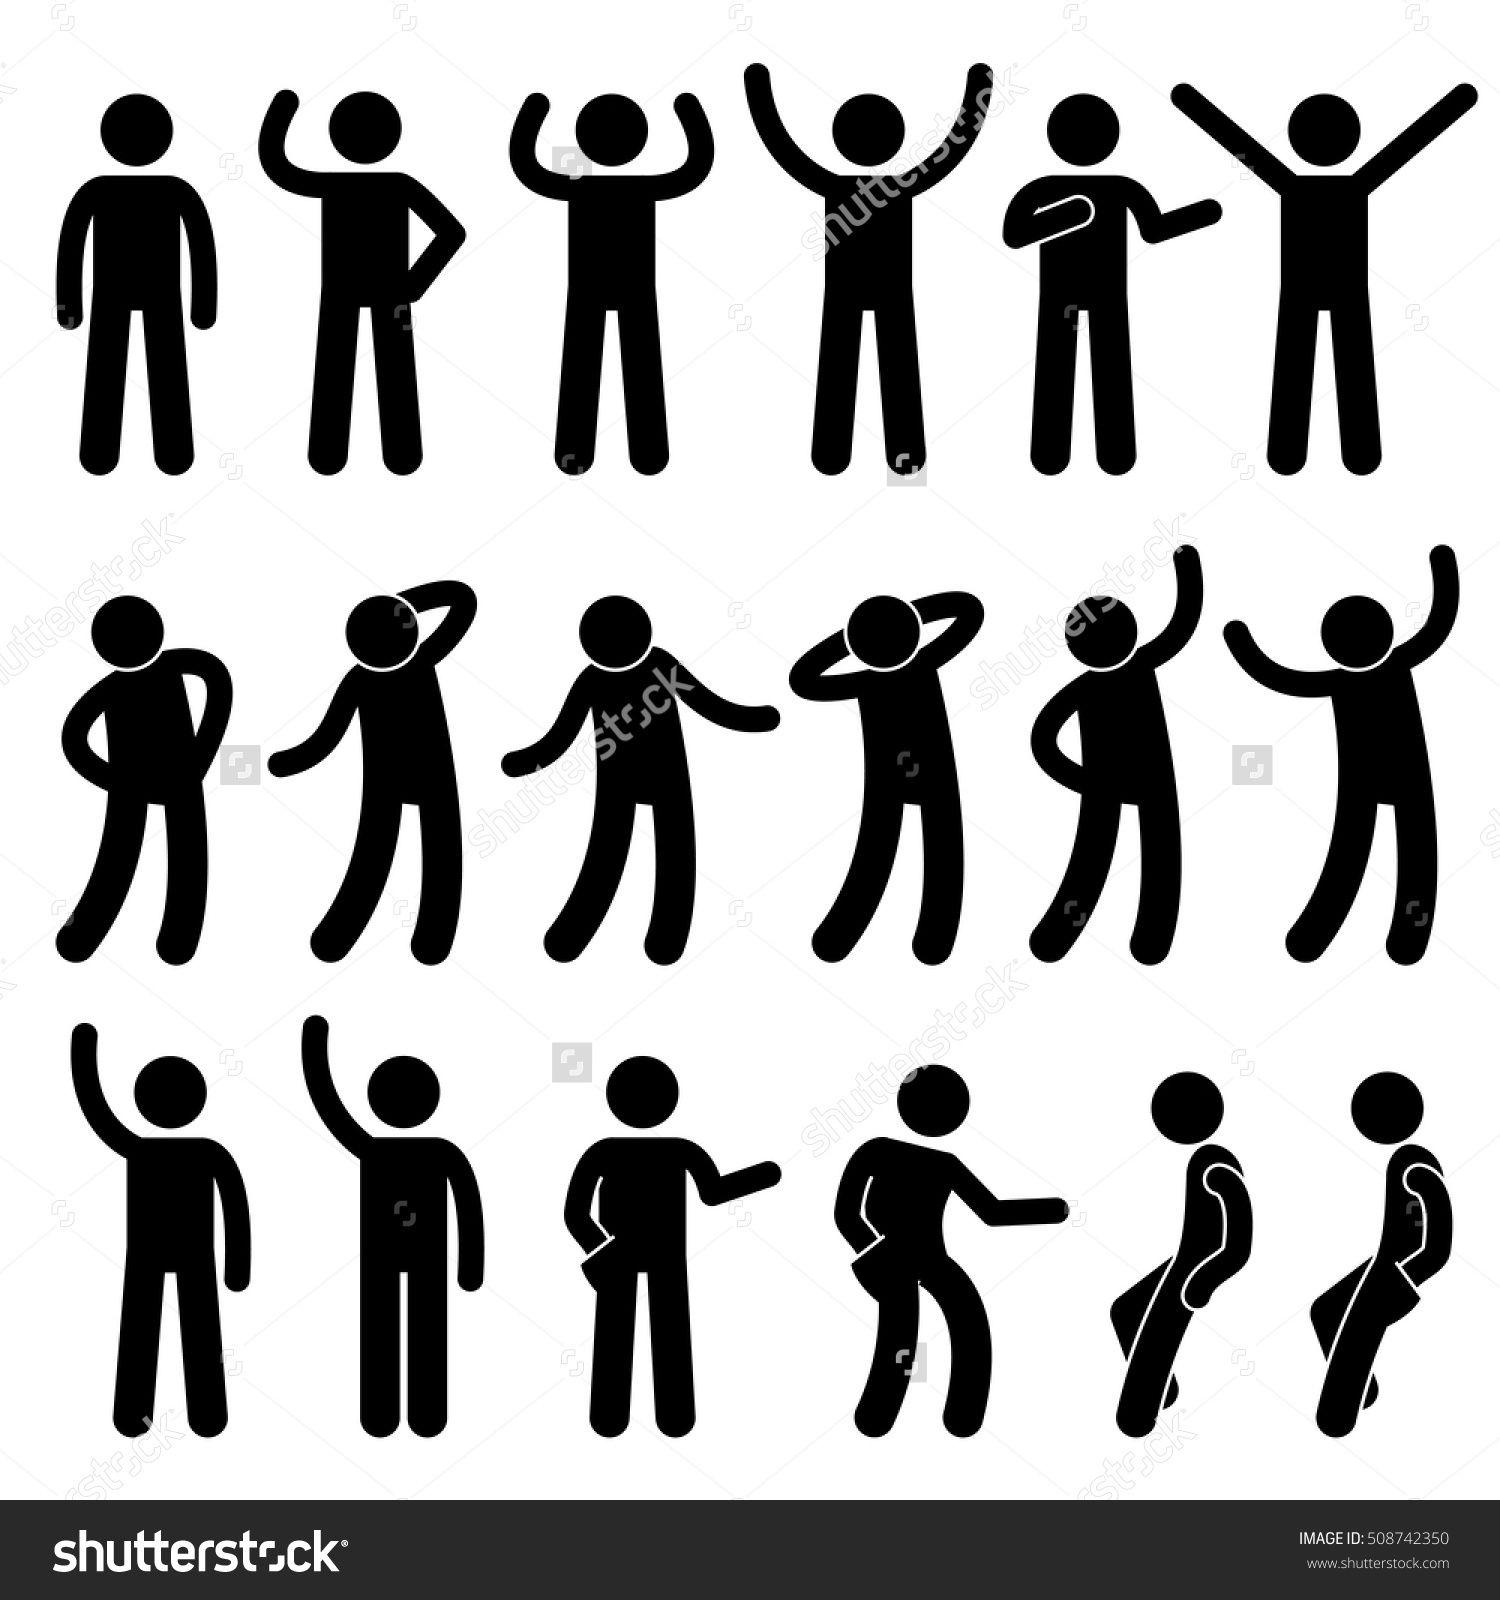 various standing postures poses human man people stick